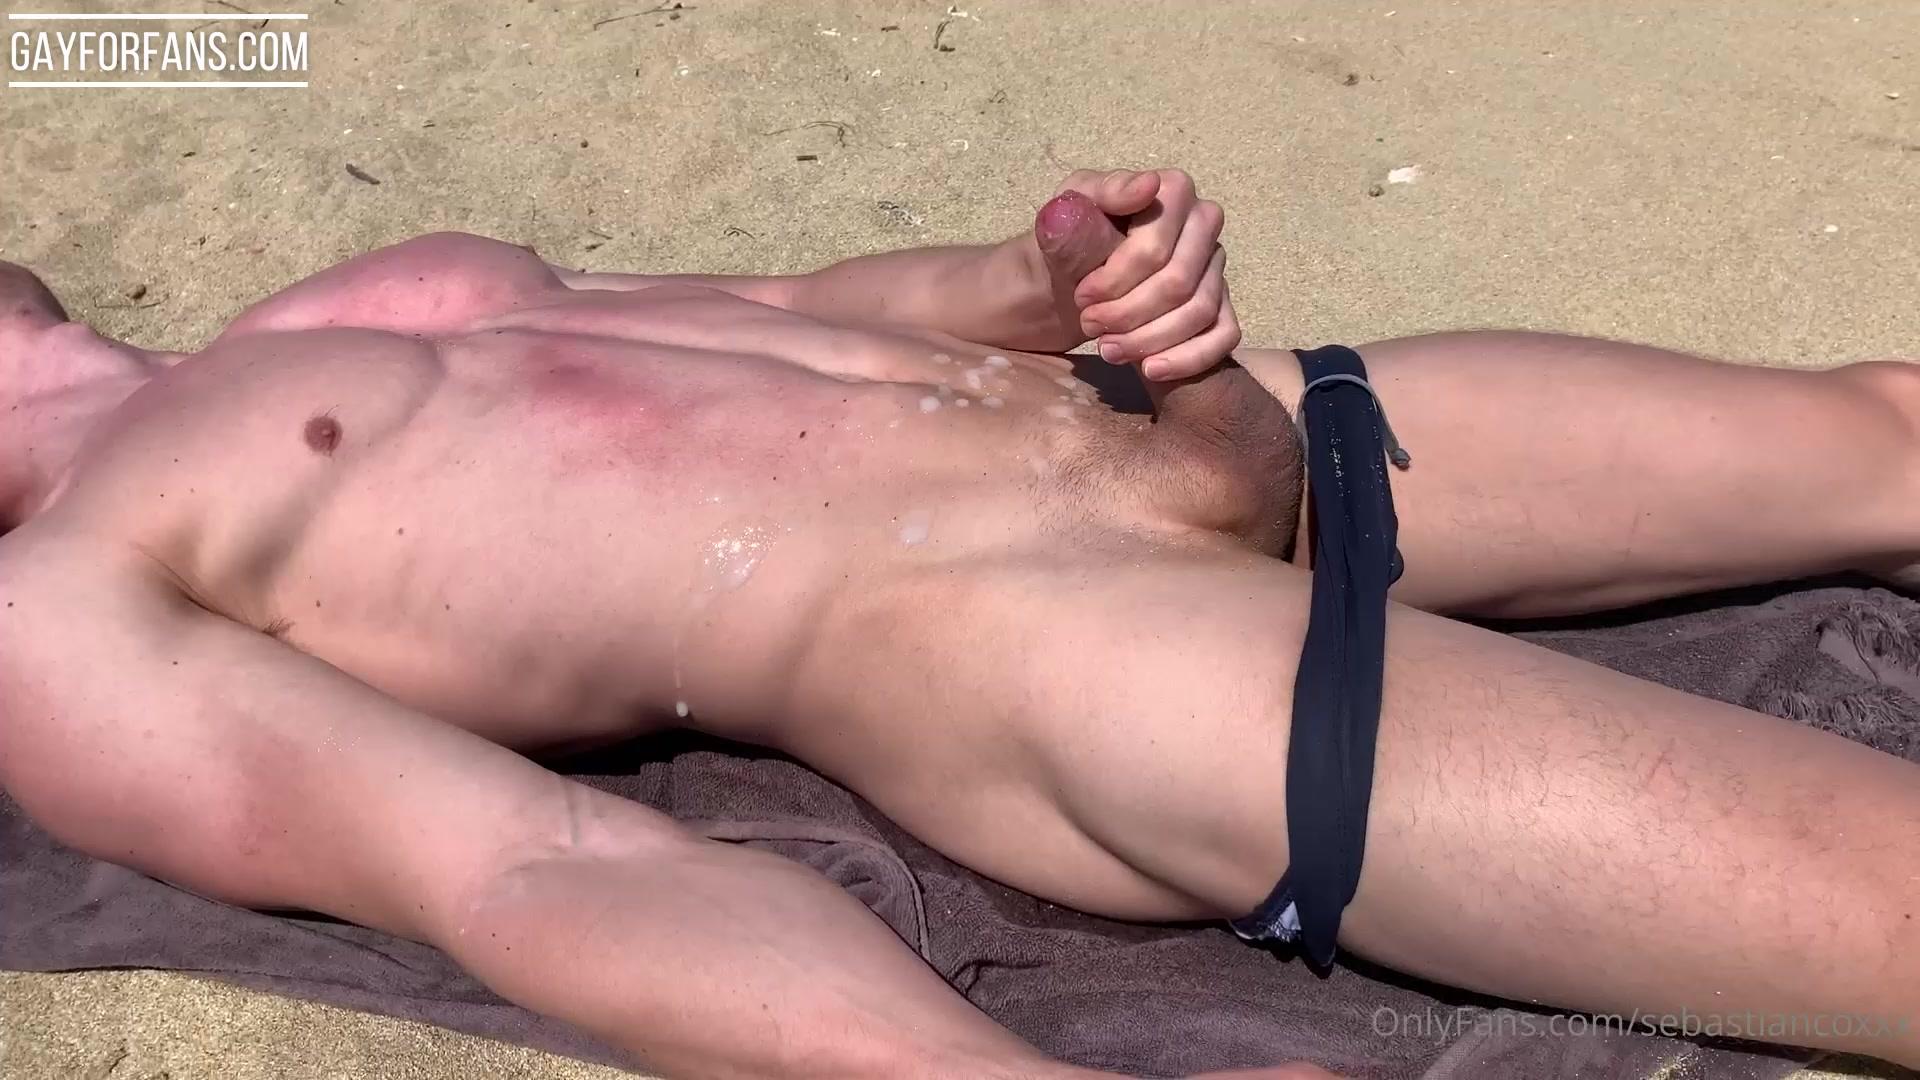 SebastianCoxxx jerking off at the beach